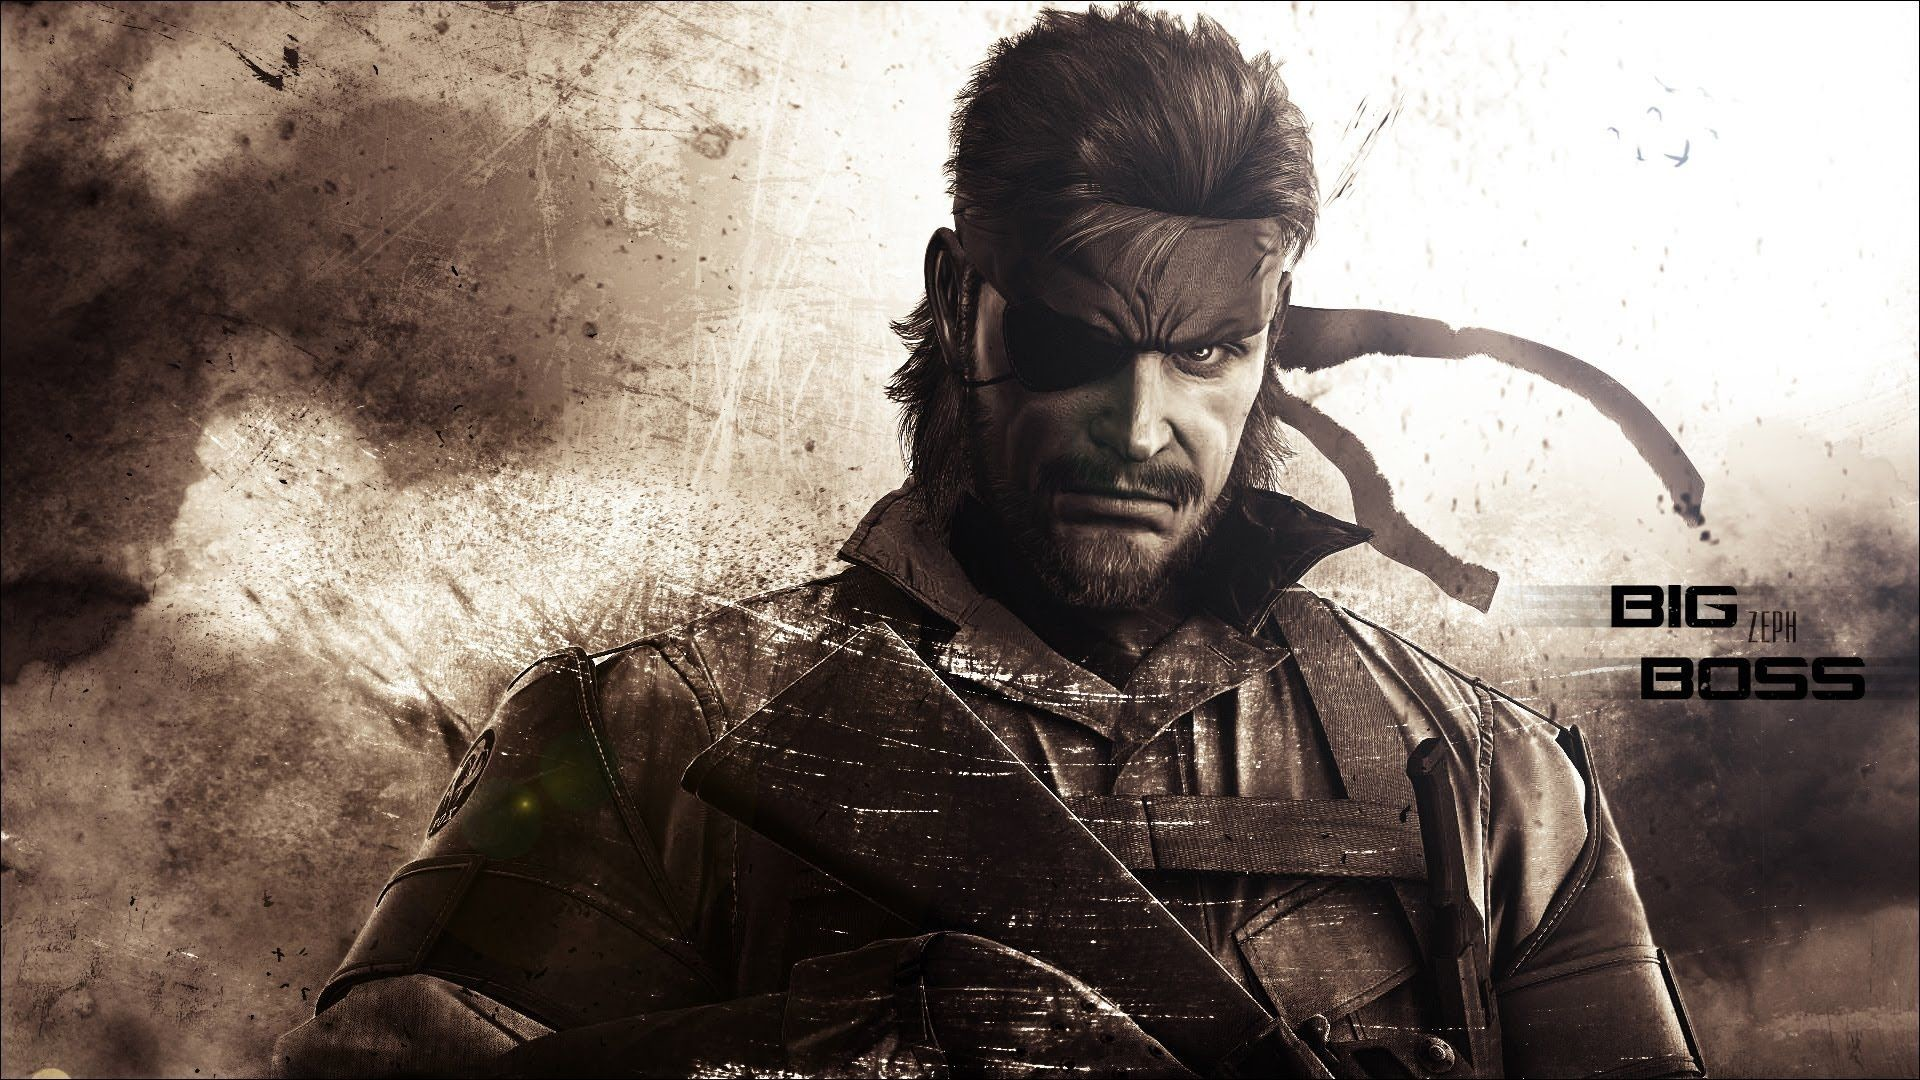 Metal Gear Solid Peace Walker Psp Wallpaper images